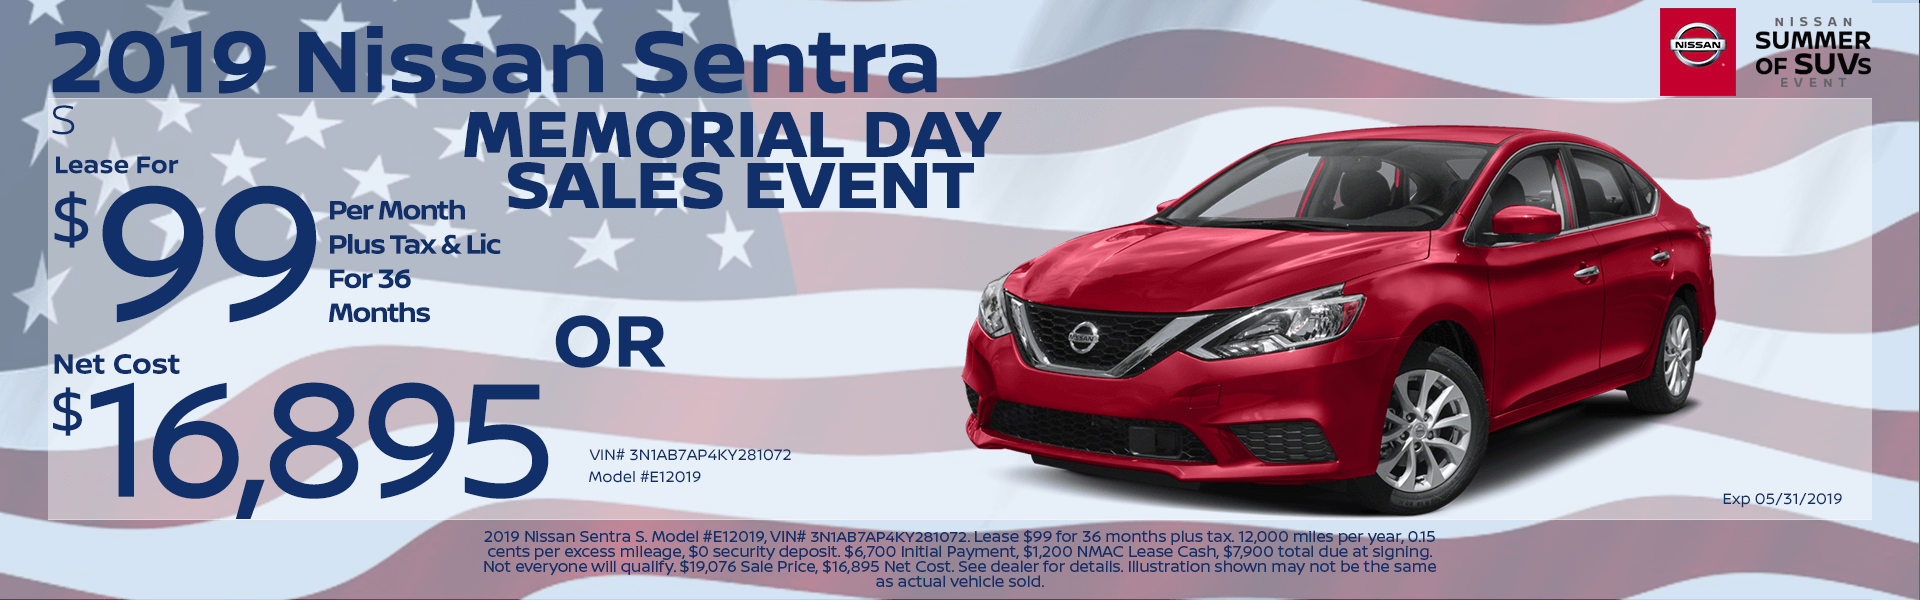 2019 Nissan Sentra Special